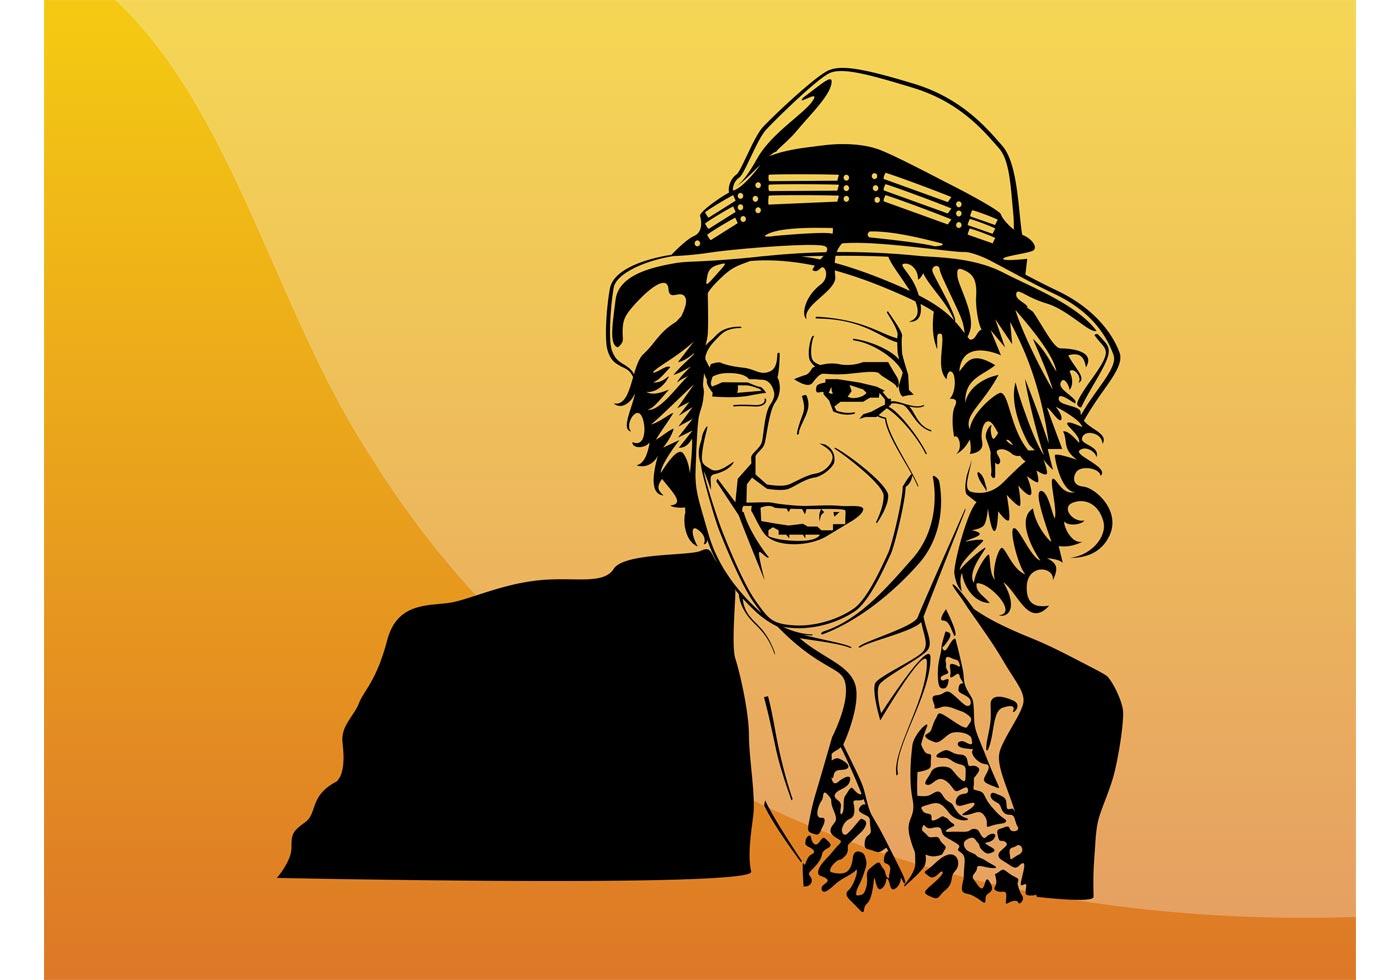 Keith Richards Portrait - Download Free Vector Art, Stock Graphics ...